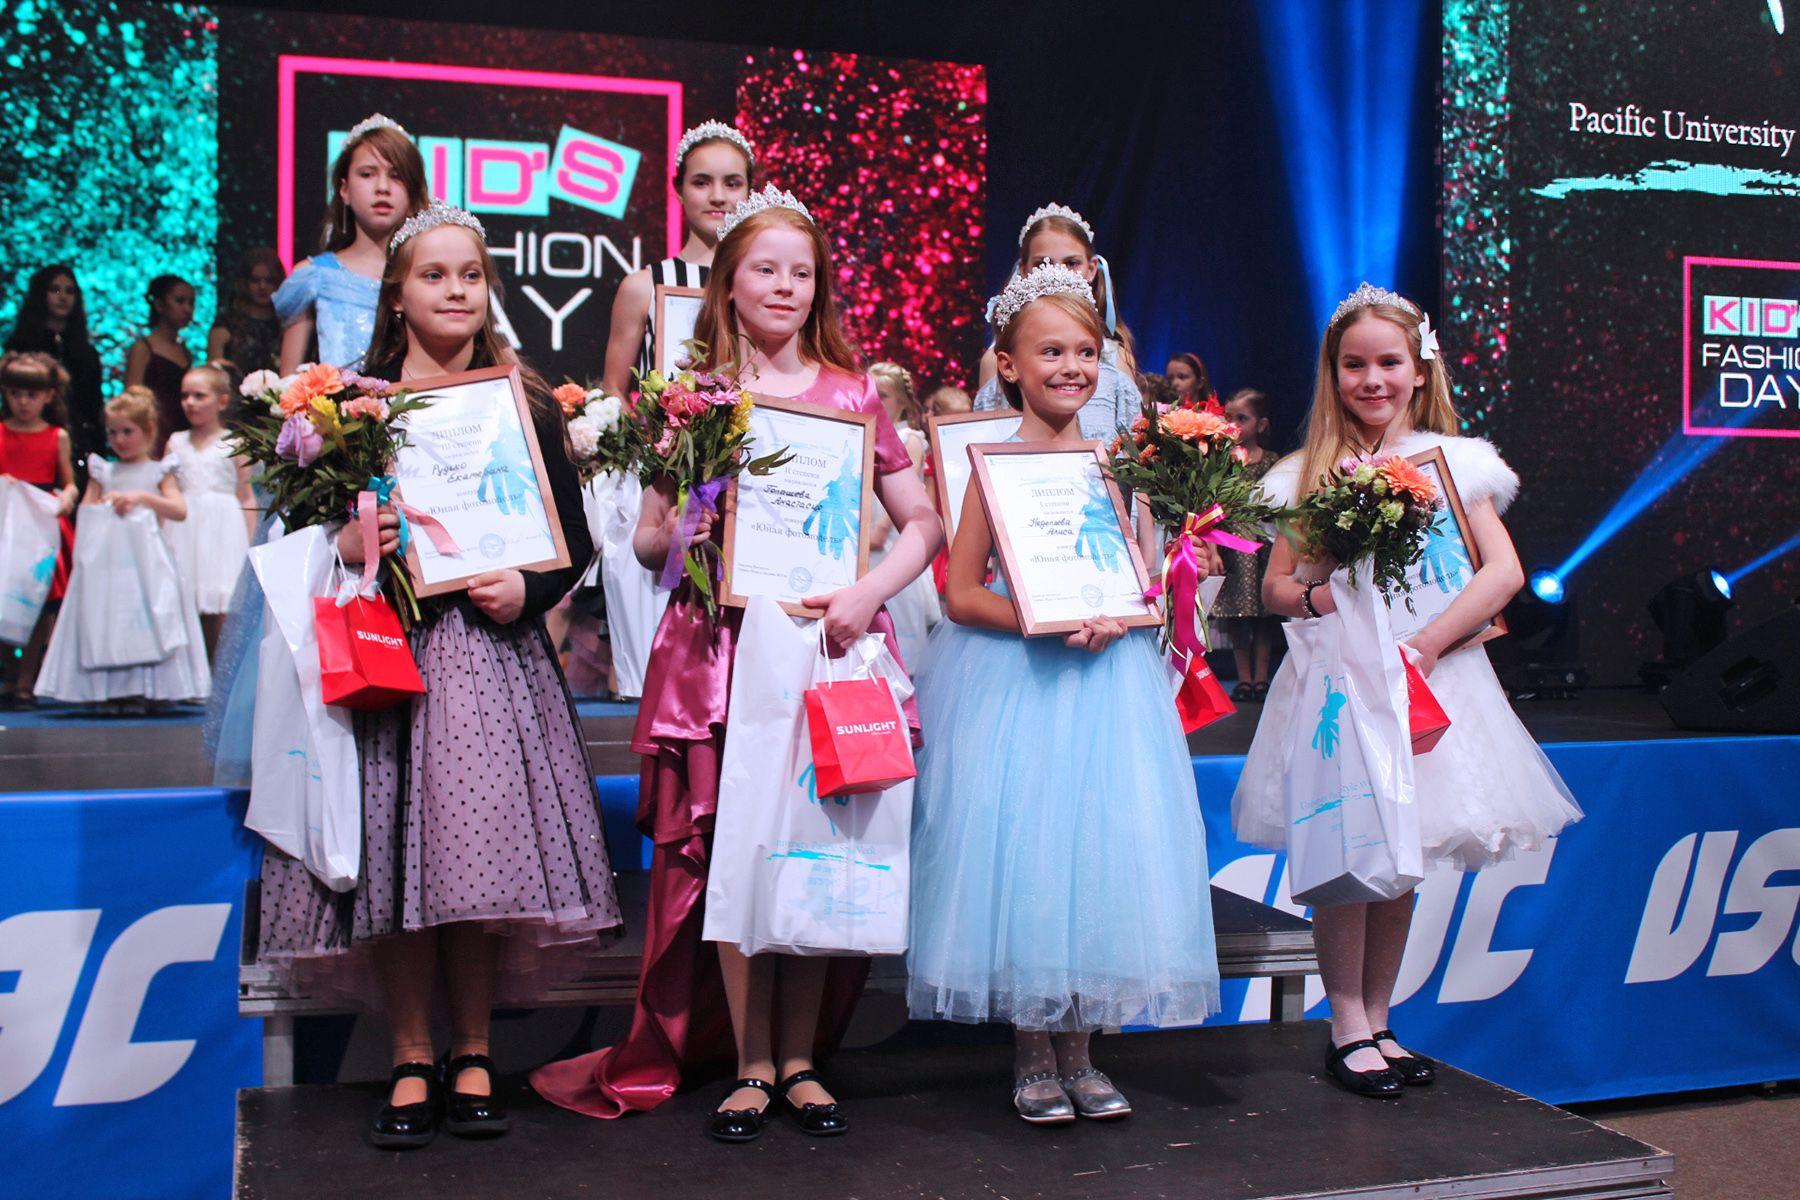 Kids Fashion Day во ВГУЭС: от конкурса дефиле до фестиваля театров моды